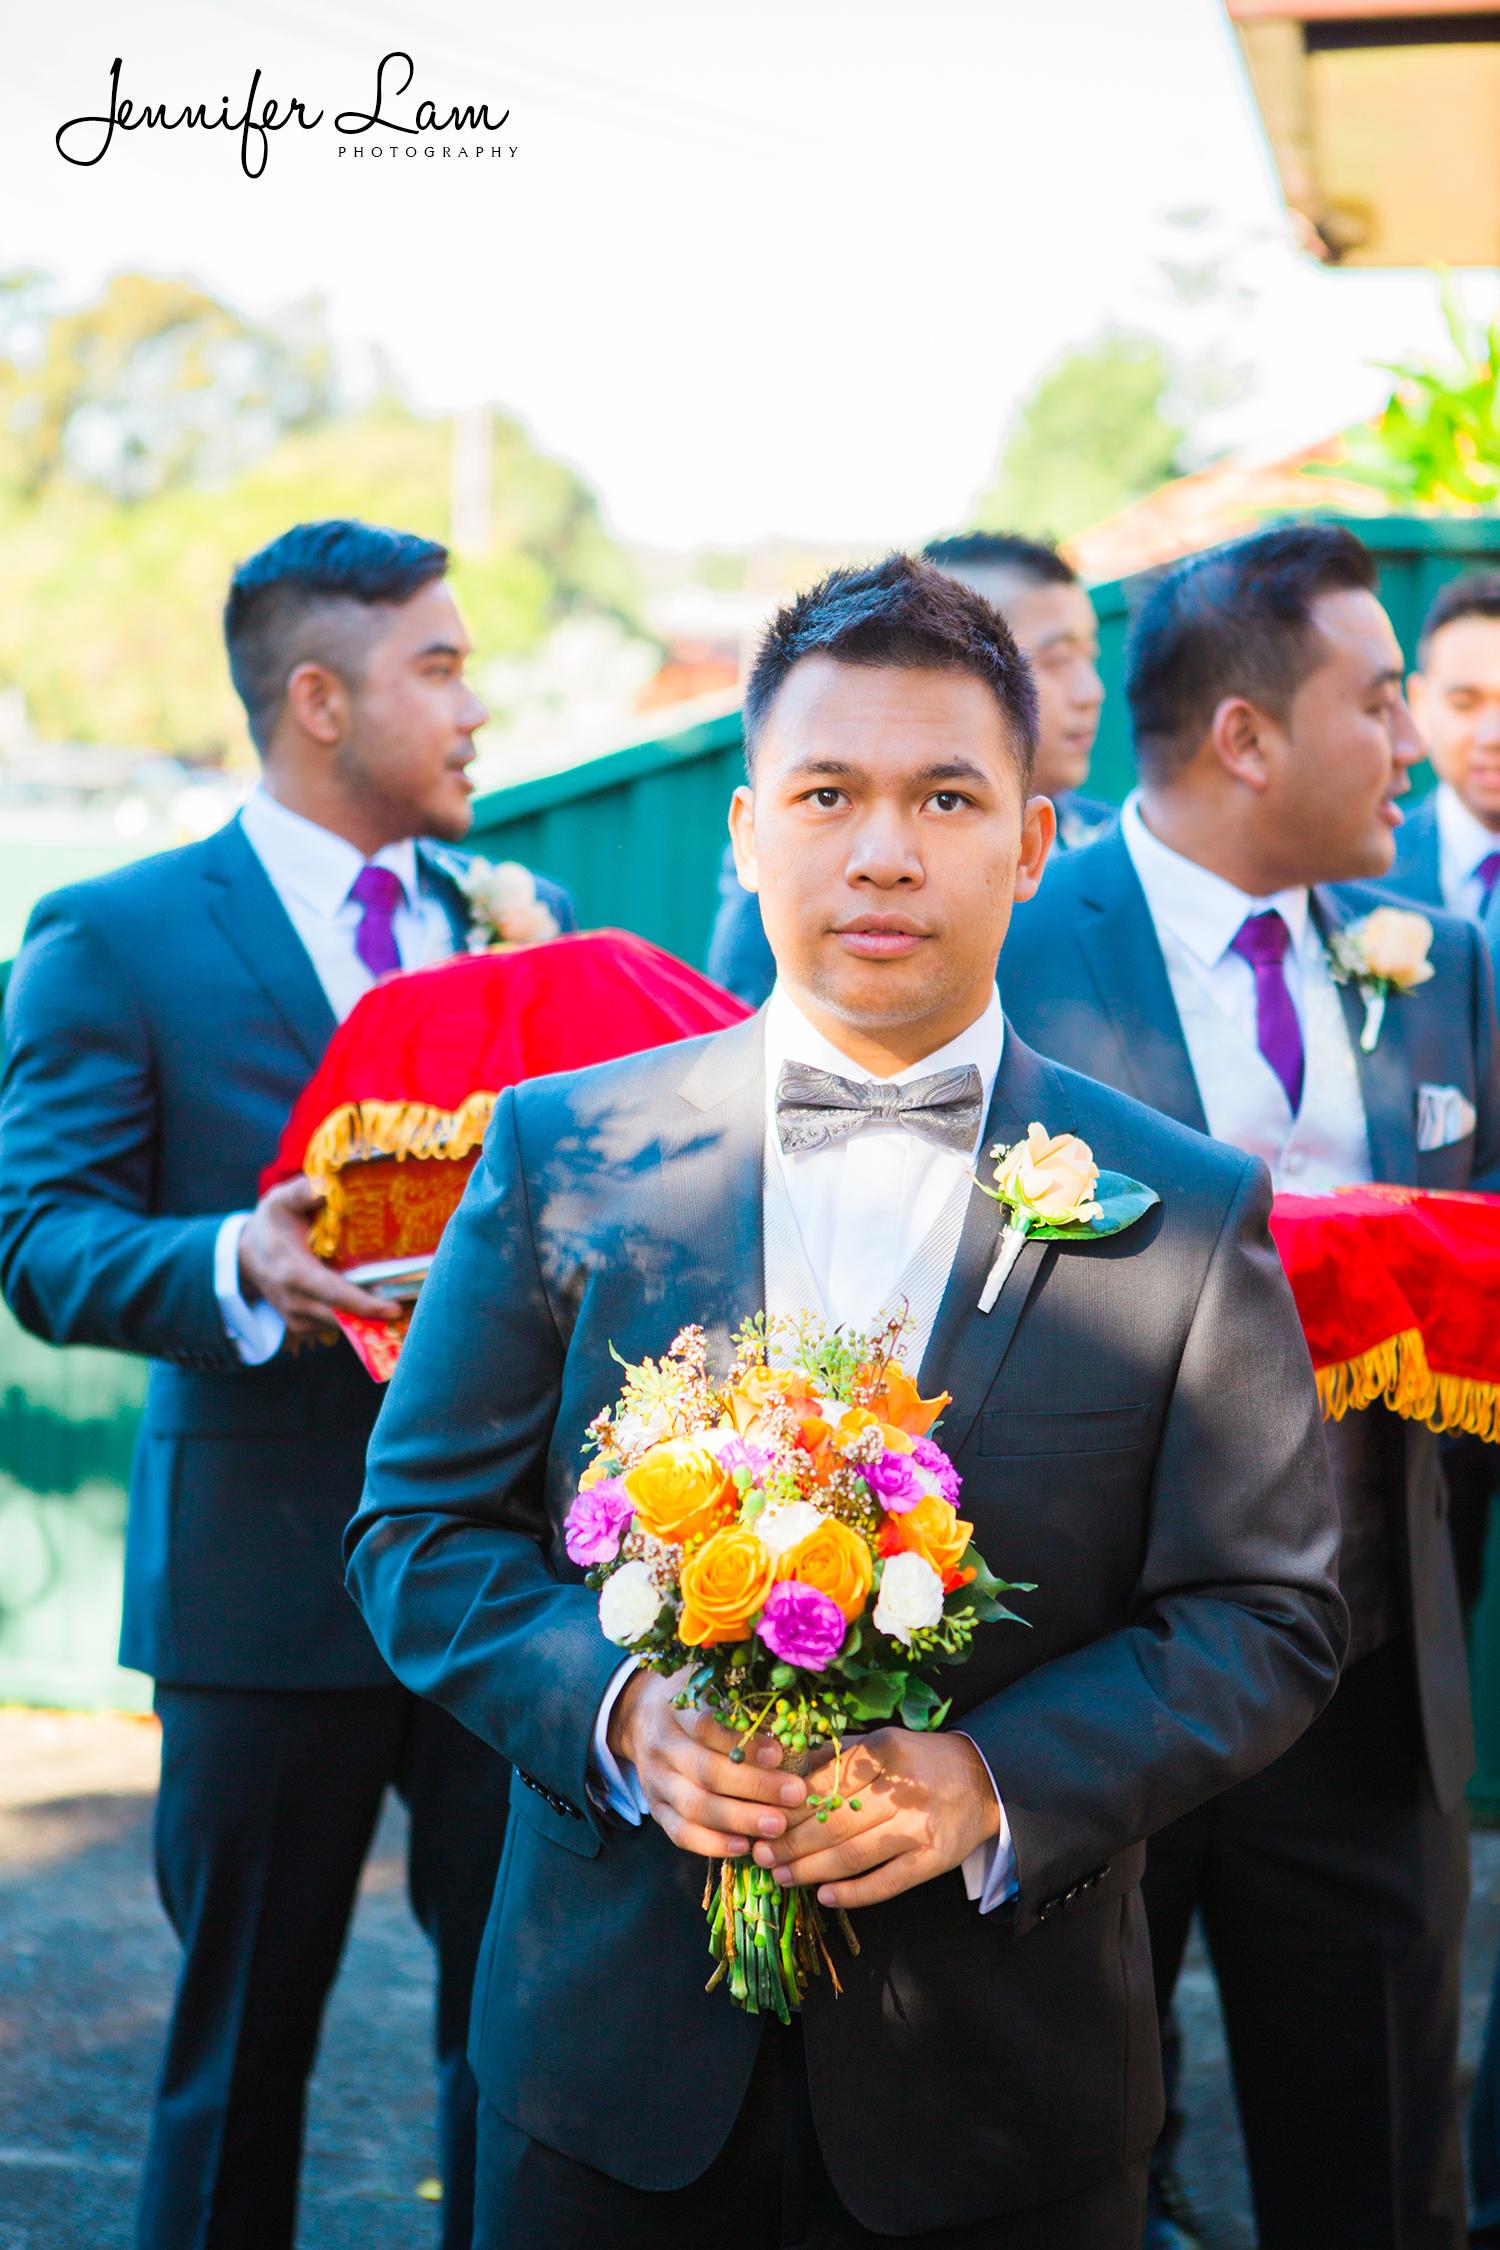 Sydney Wedding Photographer - Jennifer Lam Photography (24).jpg